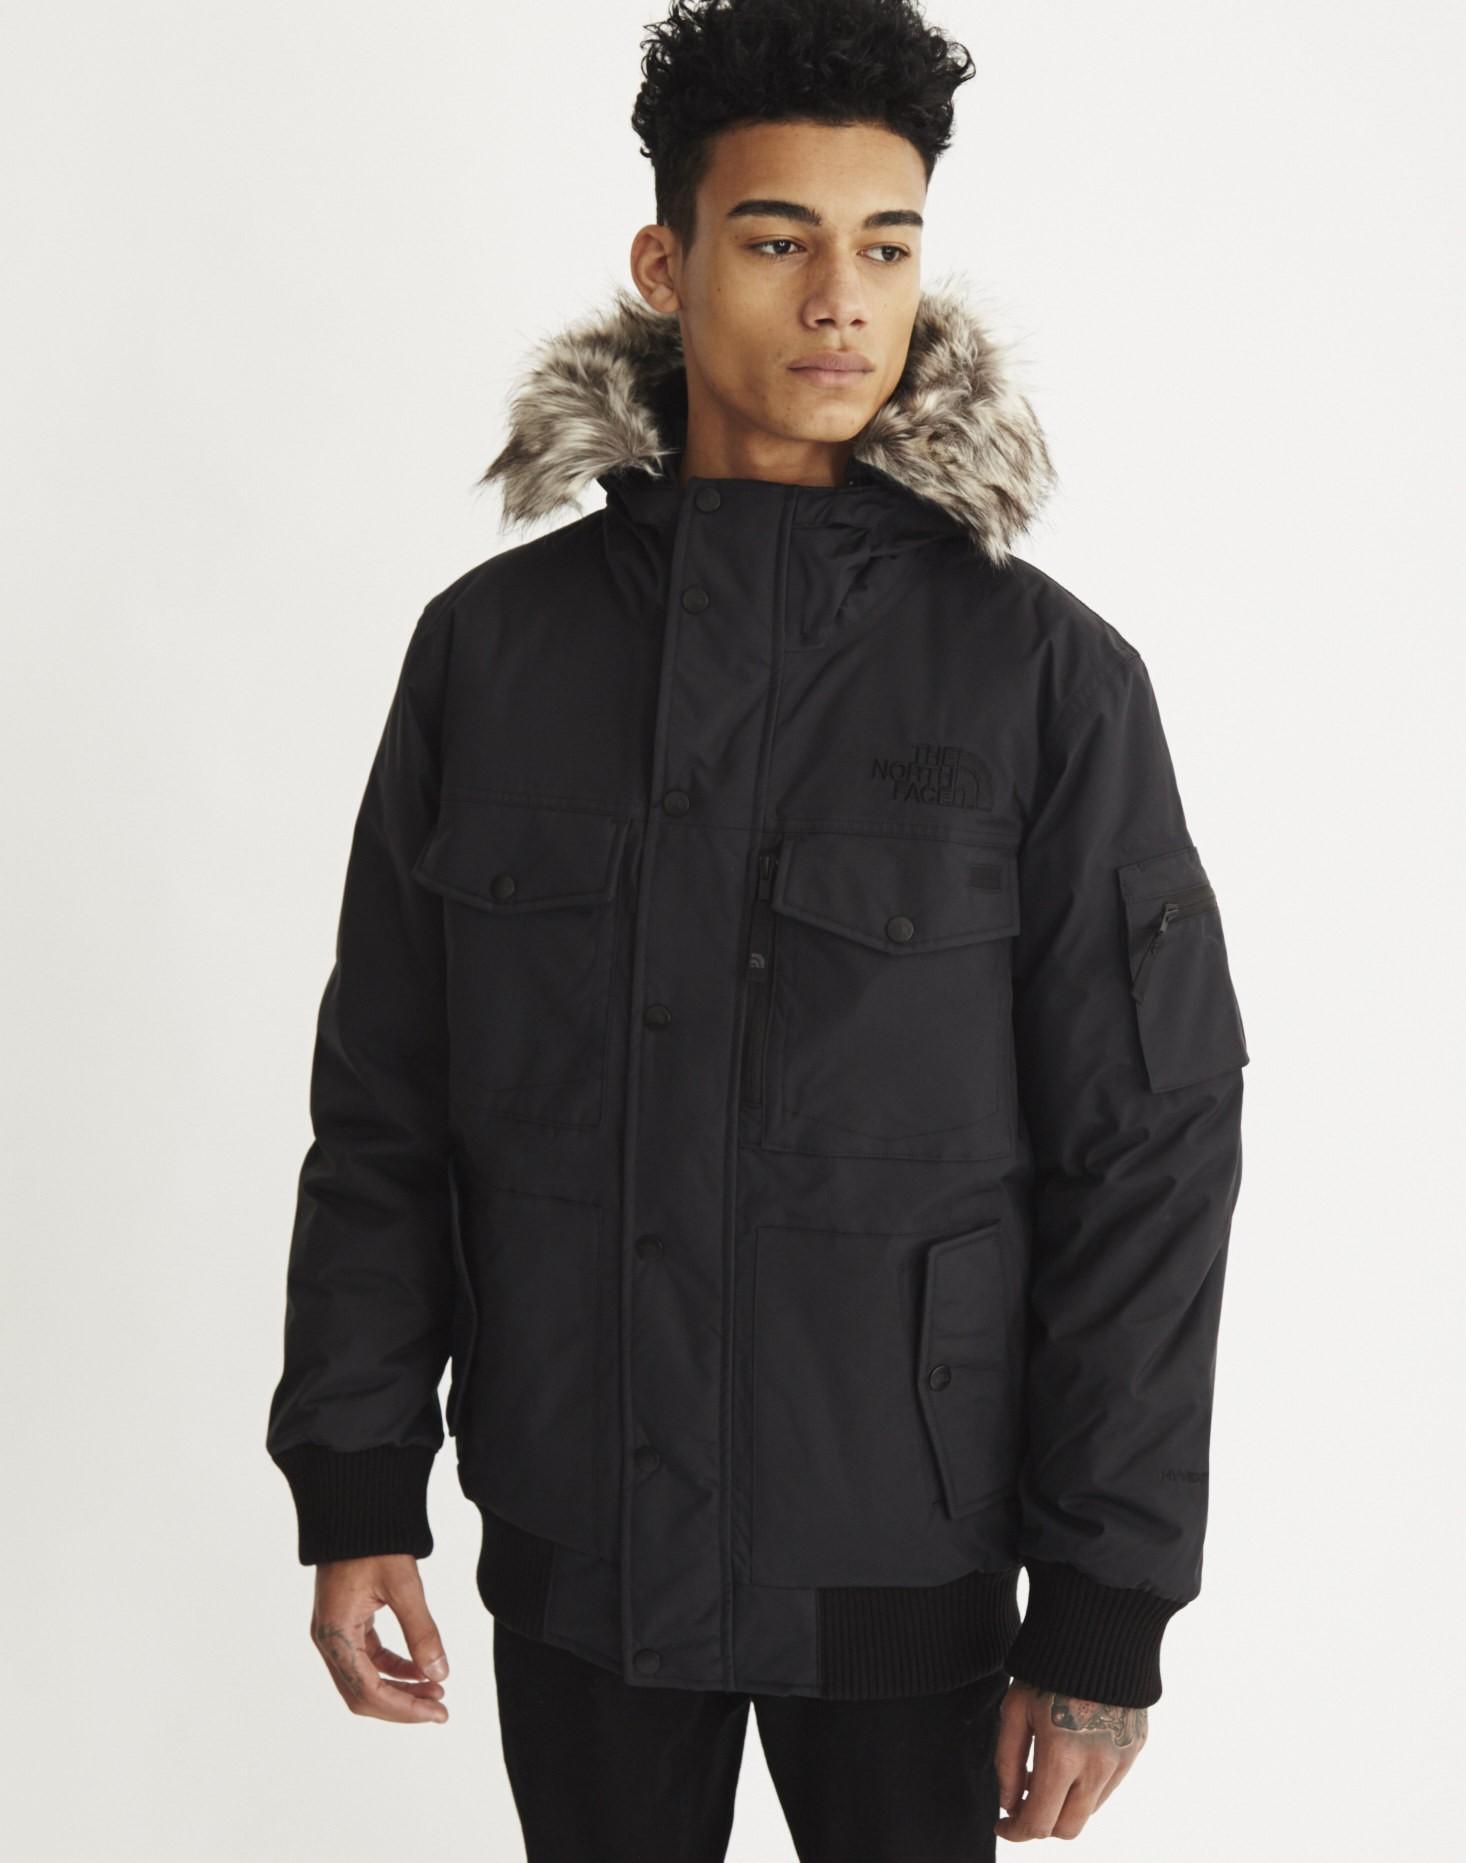 North Face 550 Jacket